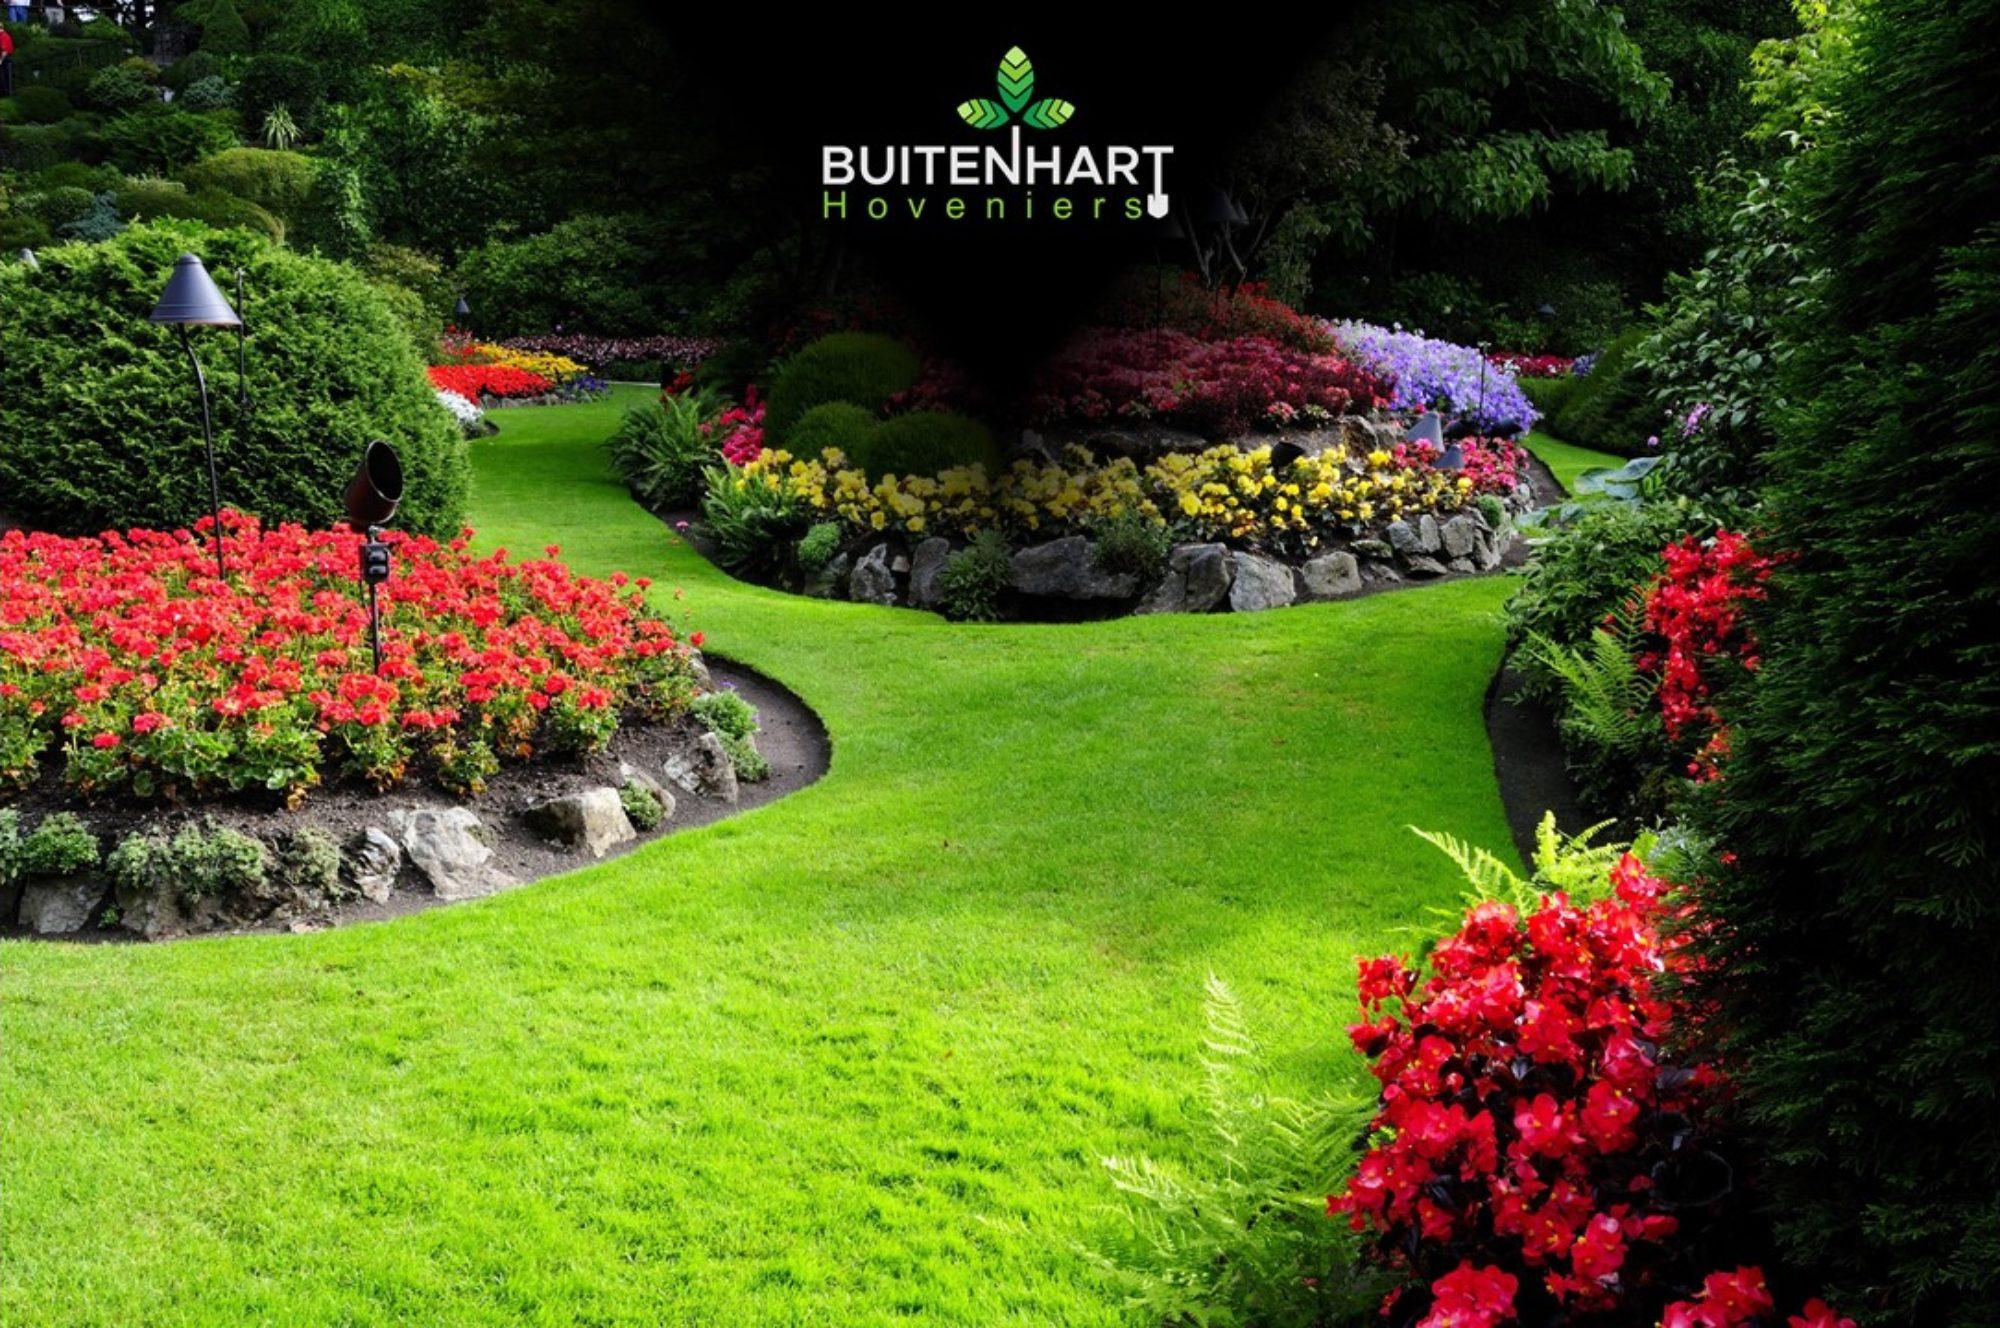 Buitenhart Hoveniers